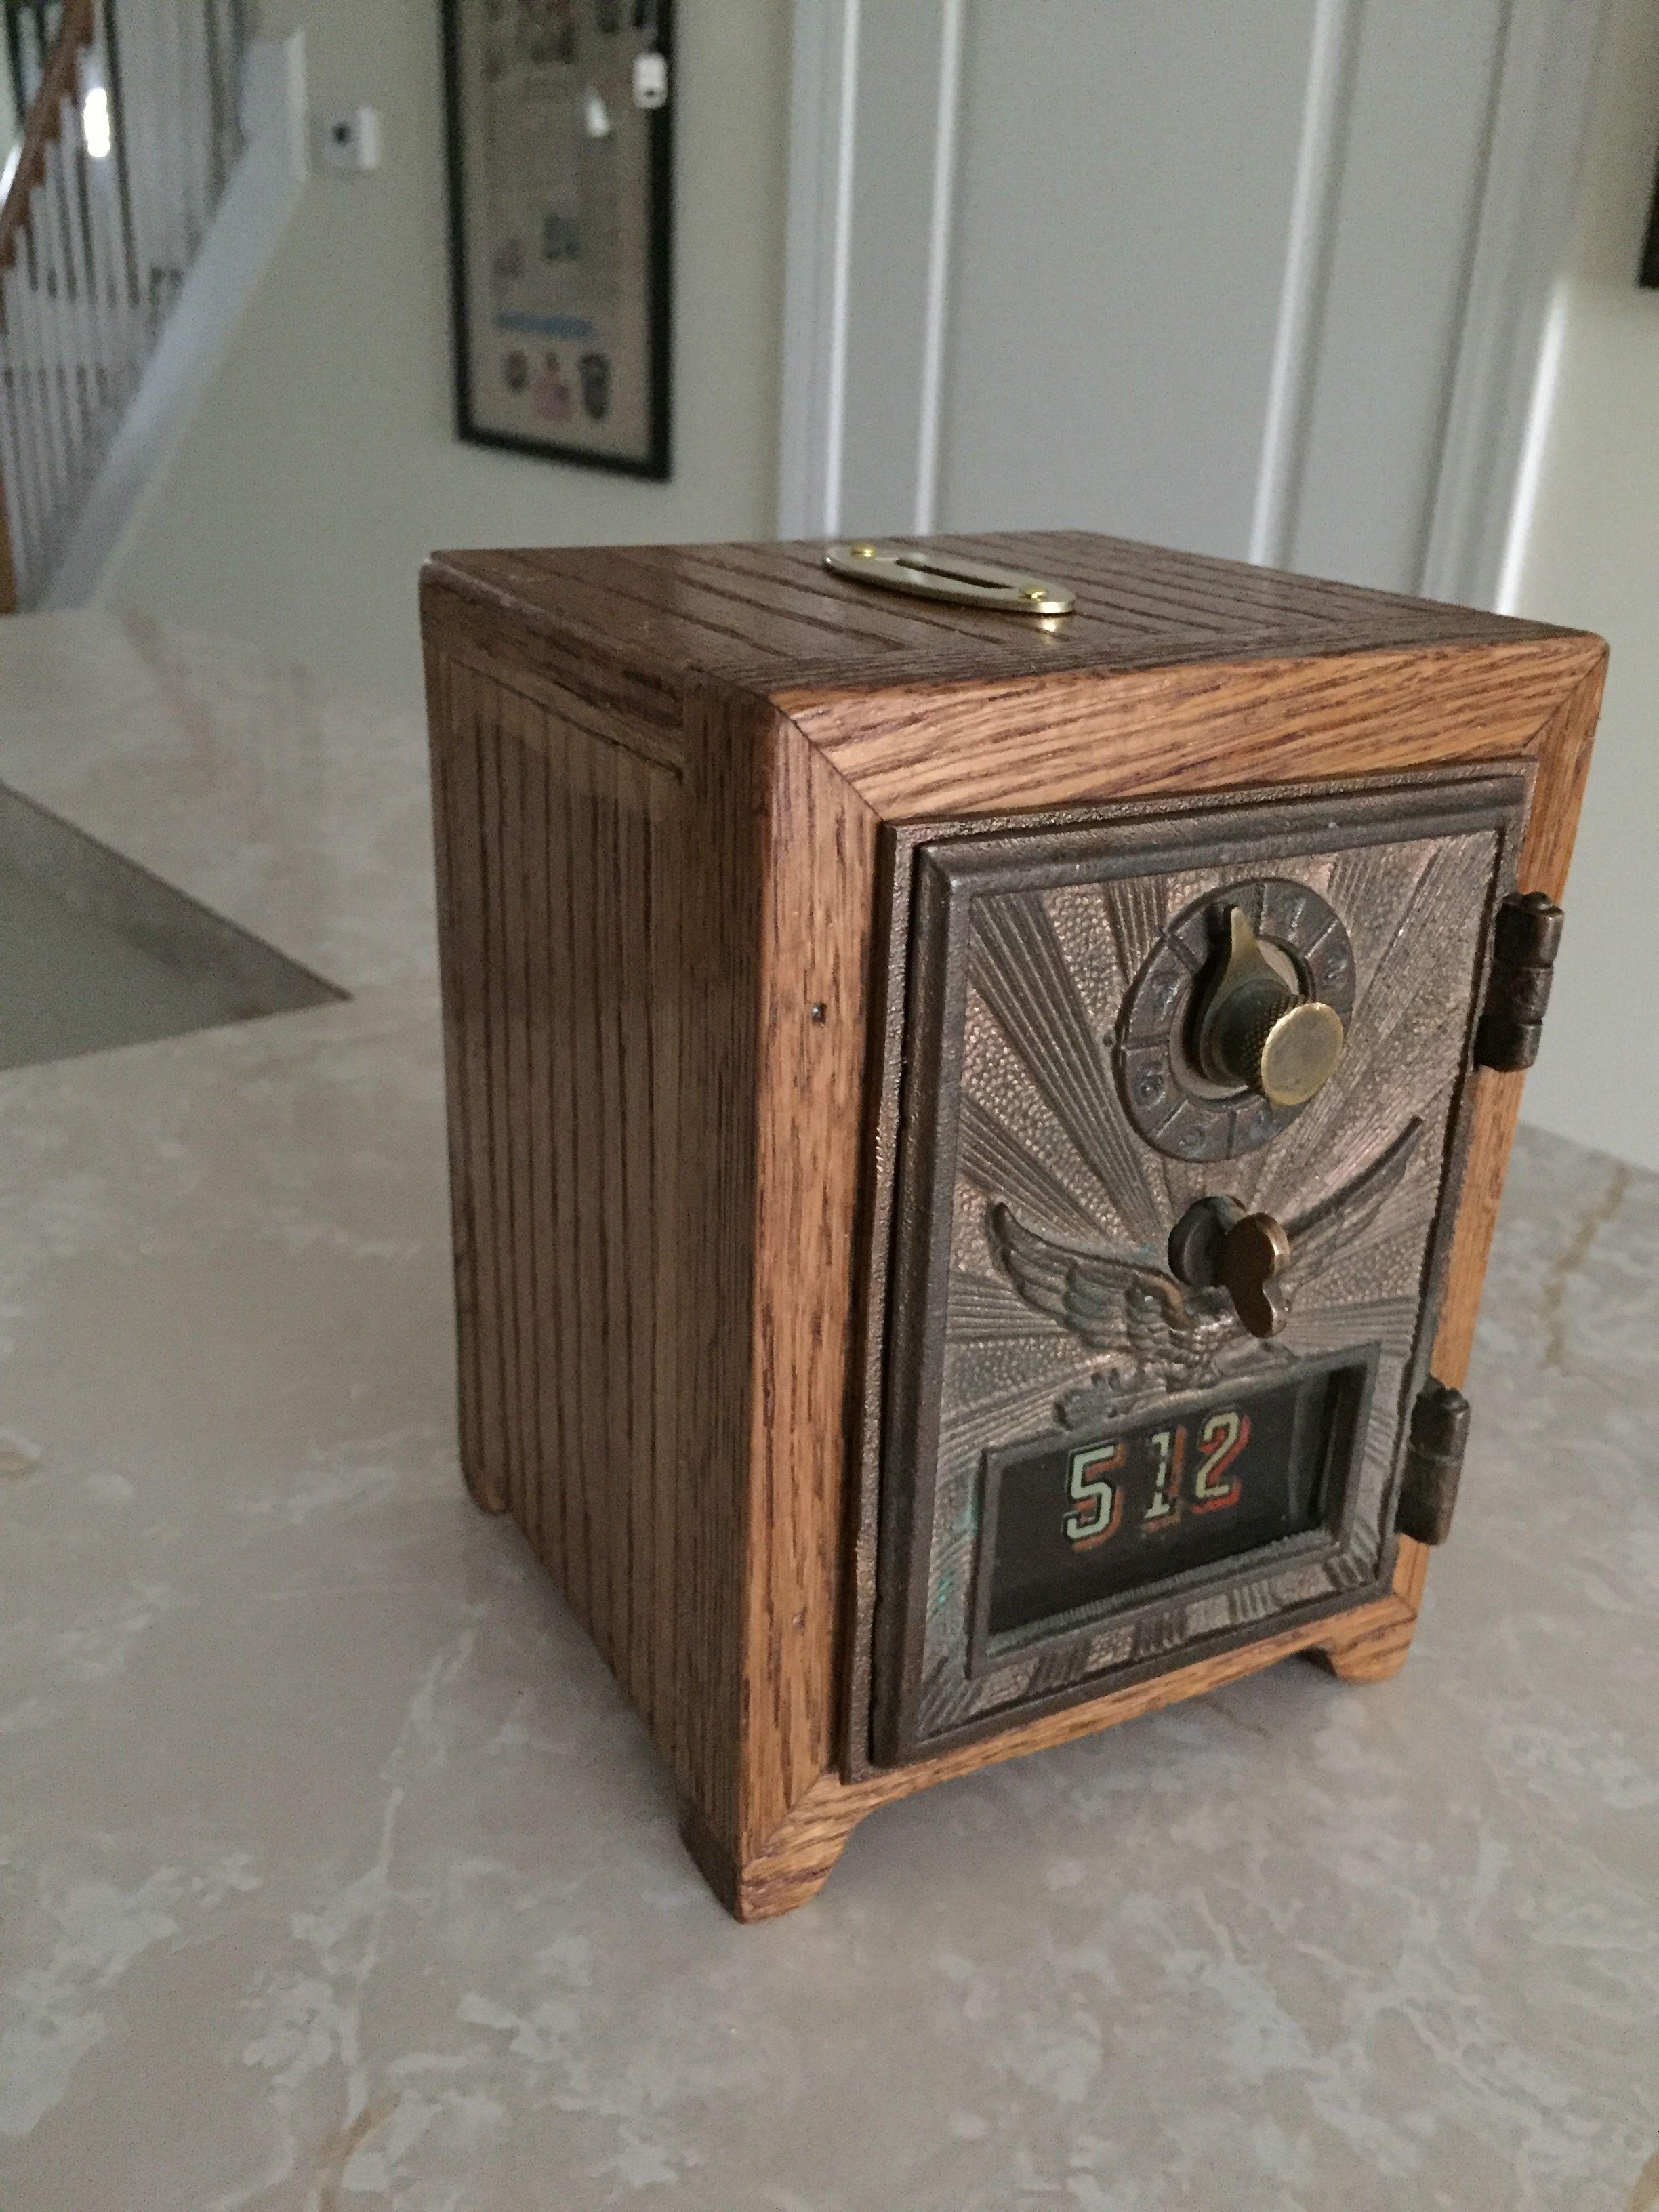 dbc04deafdd877e16e59cc5c14664a8e - How To Get A Po Box At A Post Office